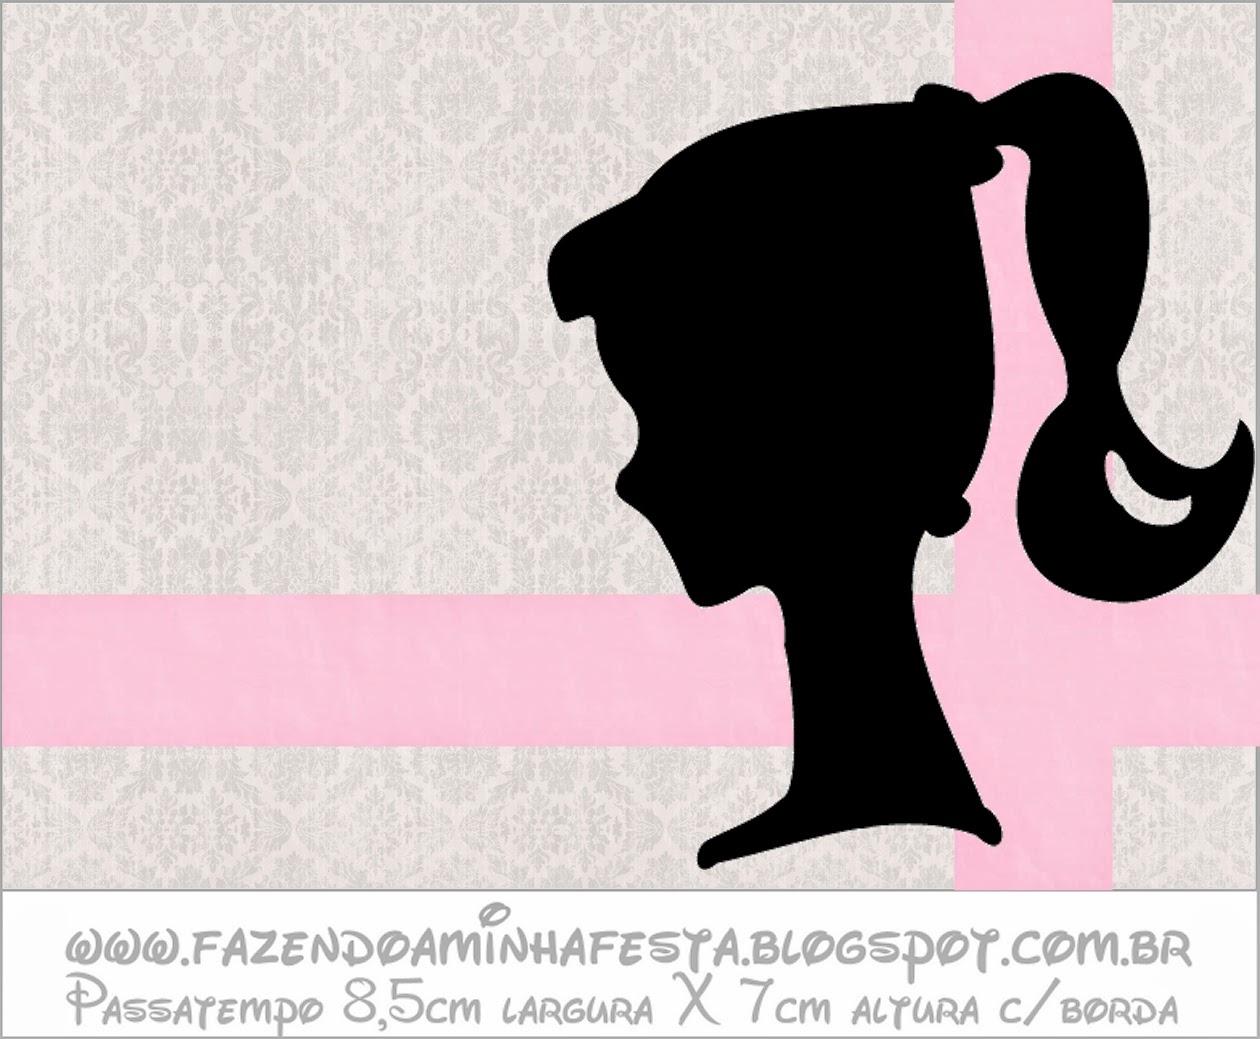 photo regarding Free Printable Barbie Silhouette identified as Barbie Silhouette: No cost Printable Sweet Buffet Labels. - Oh